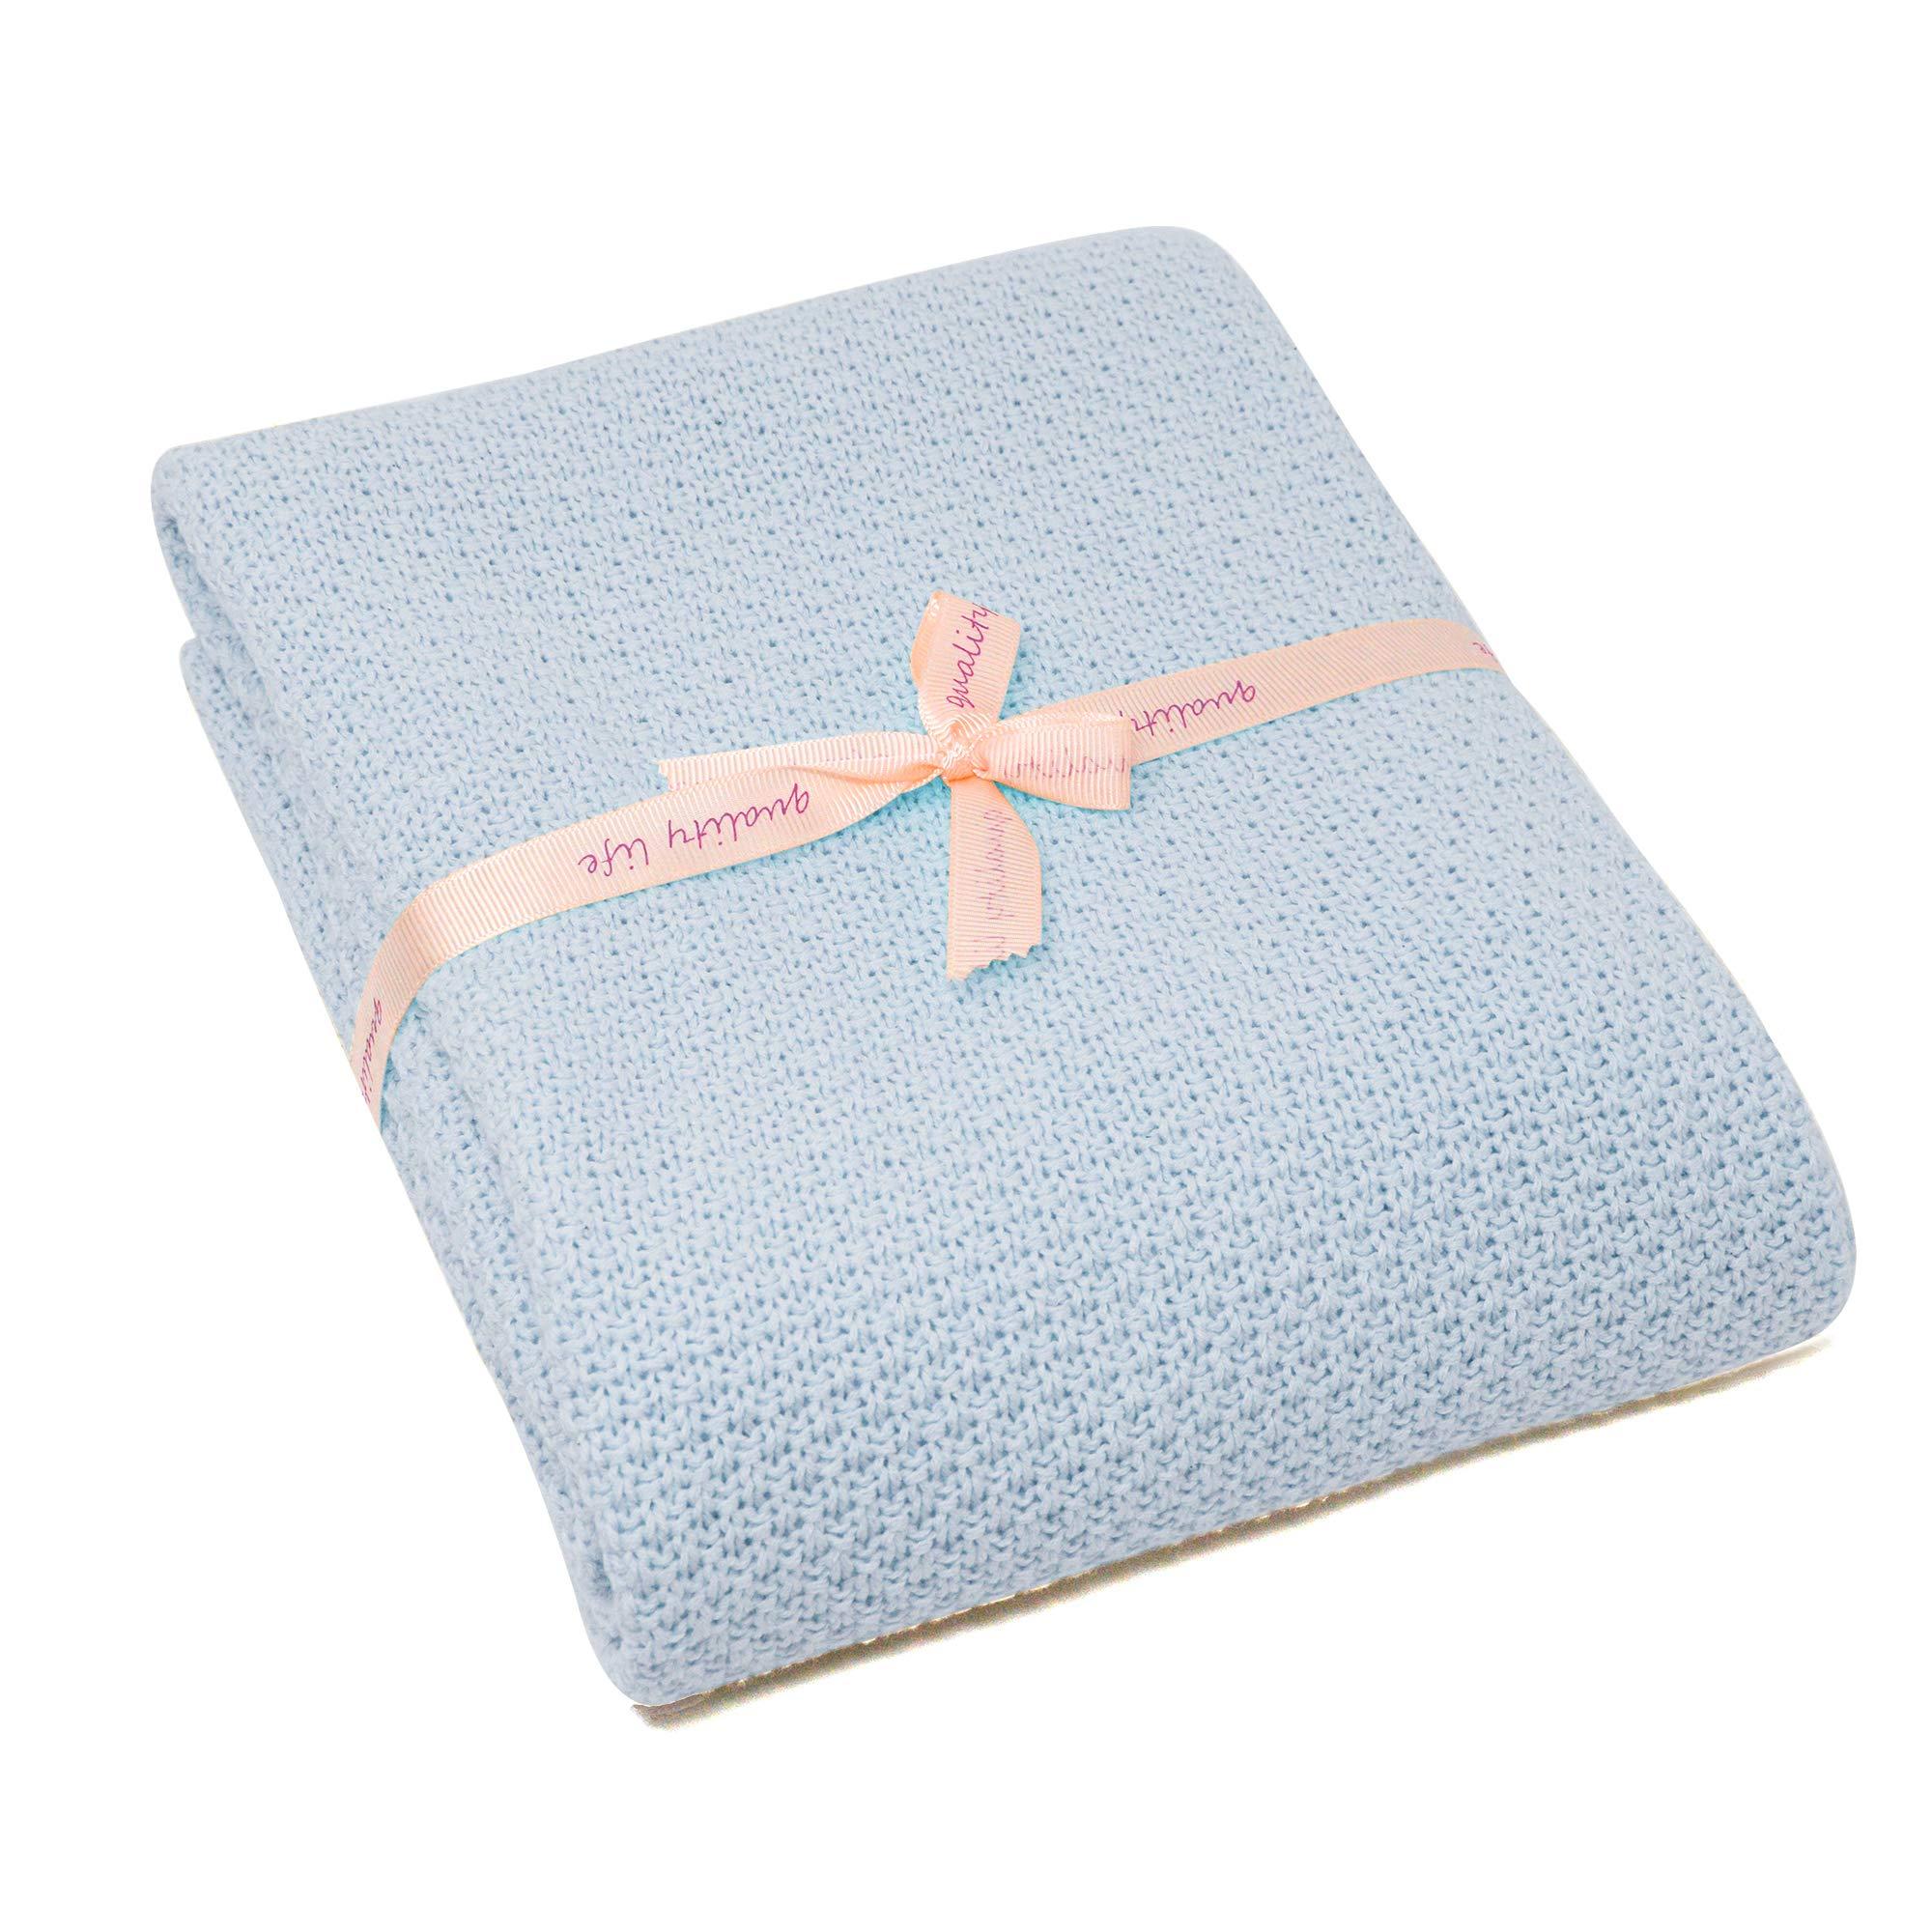 Spring Fever Baby Cozy Newborn Nursery All Season Organic Cotton Knit Bed Stroller Cover Throw Blanket Blue